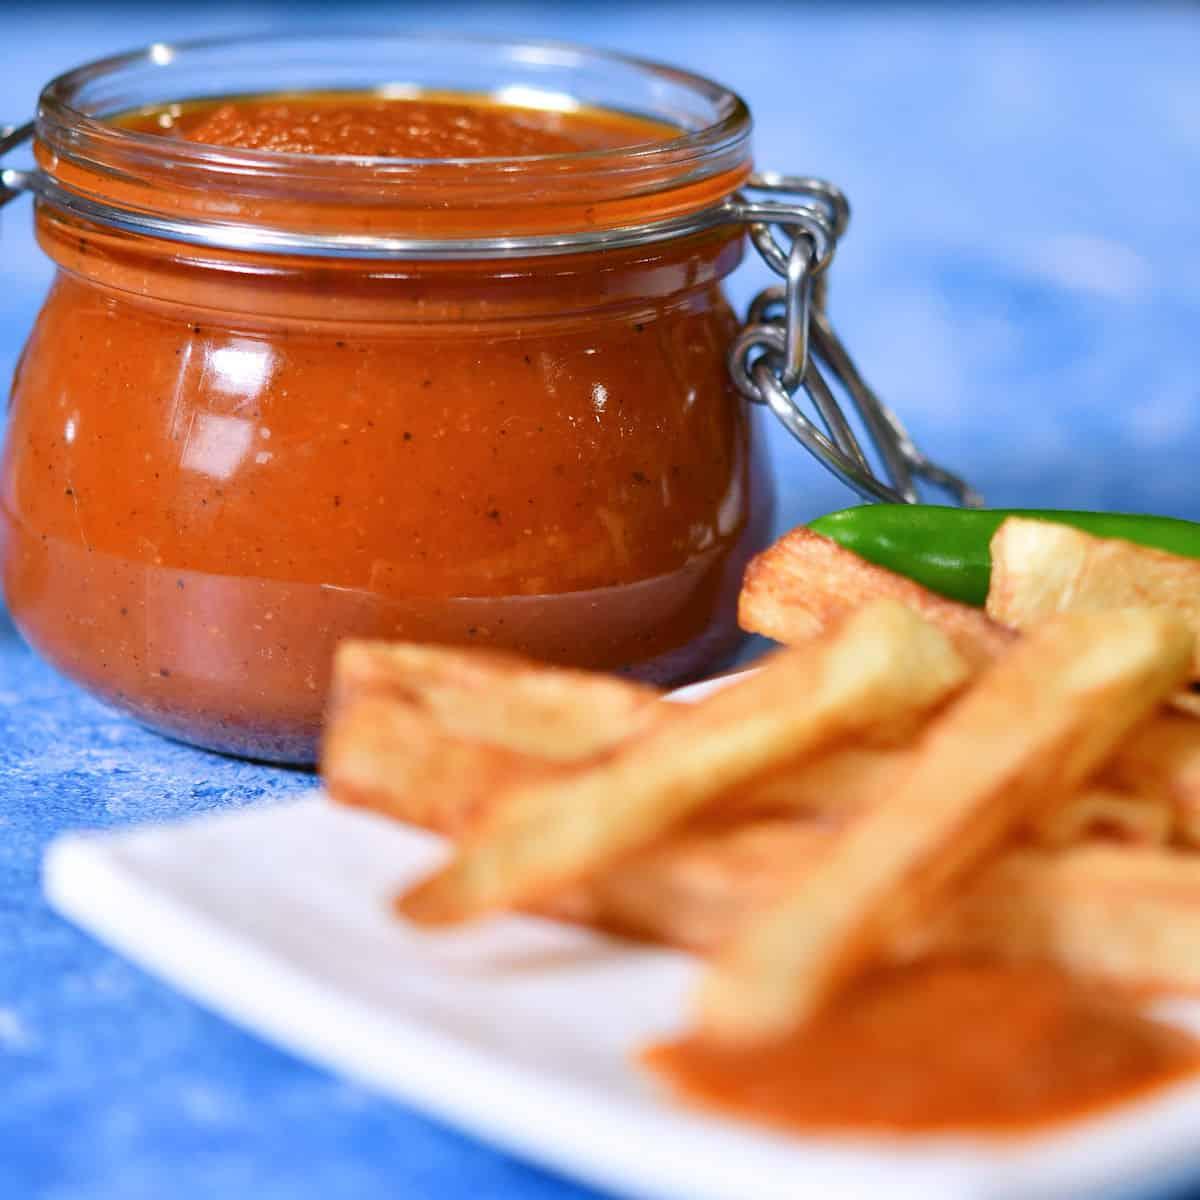 24Bite: Jalapeno Ketchup Recipe by Christian Guzman